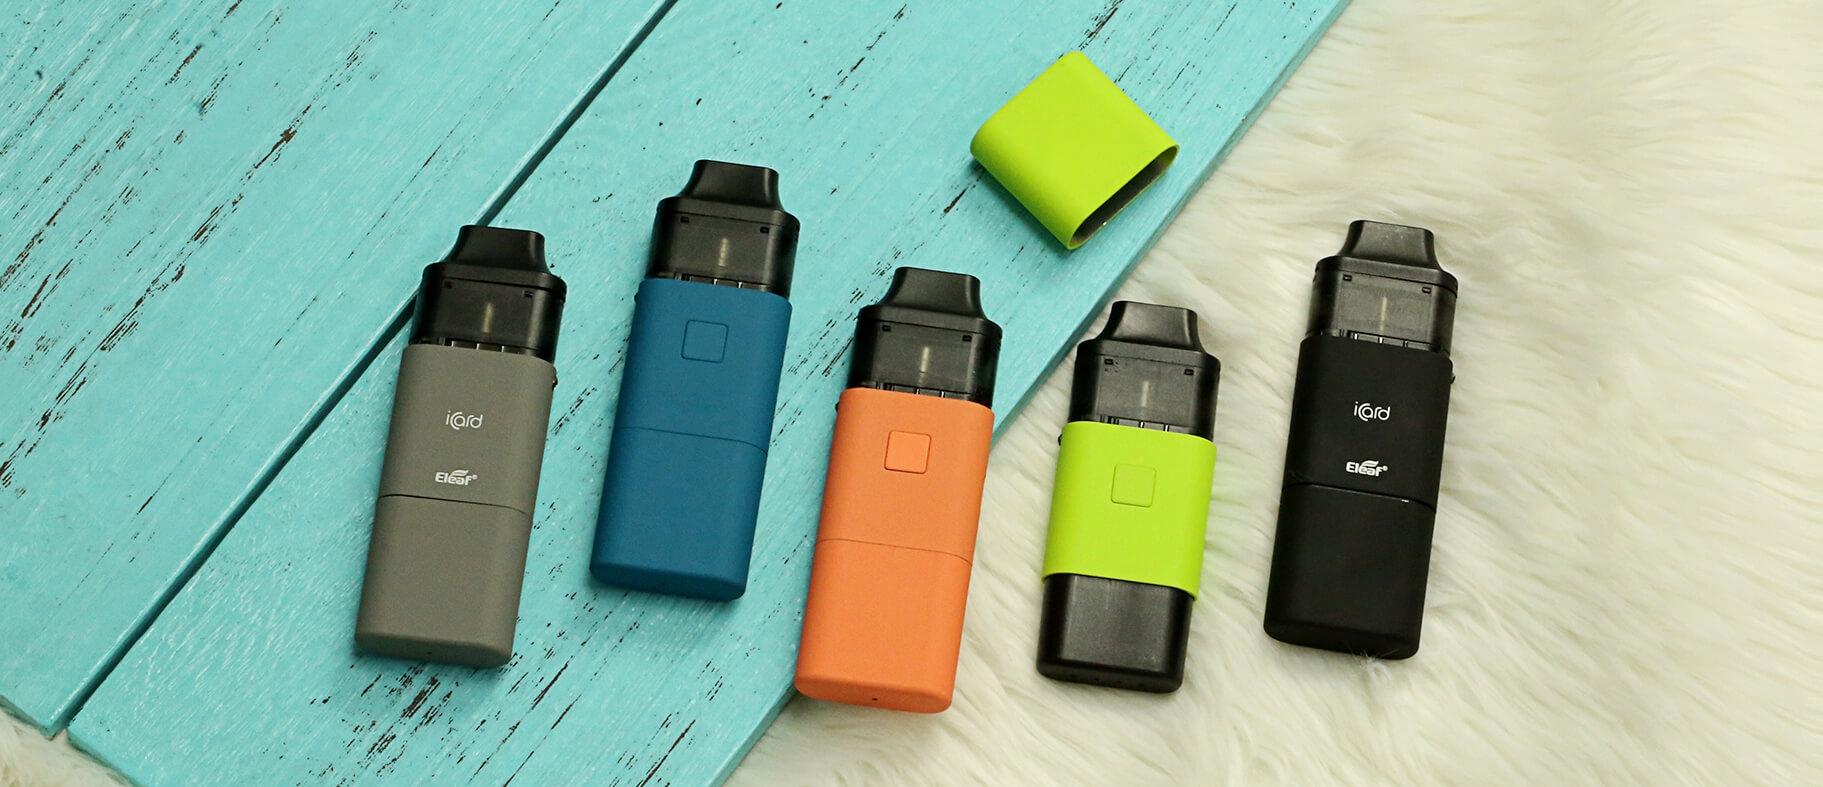 Eleaf iCard All-in-one Starter Kit